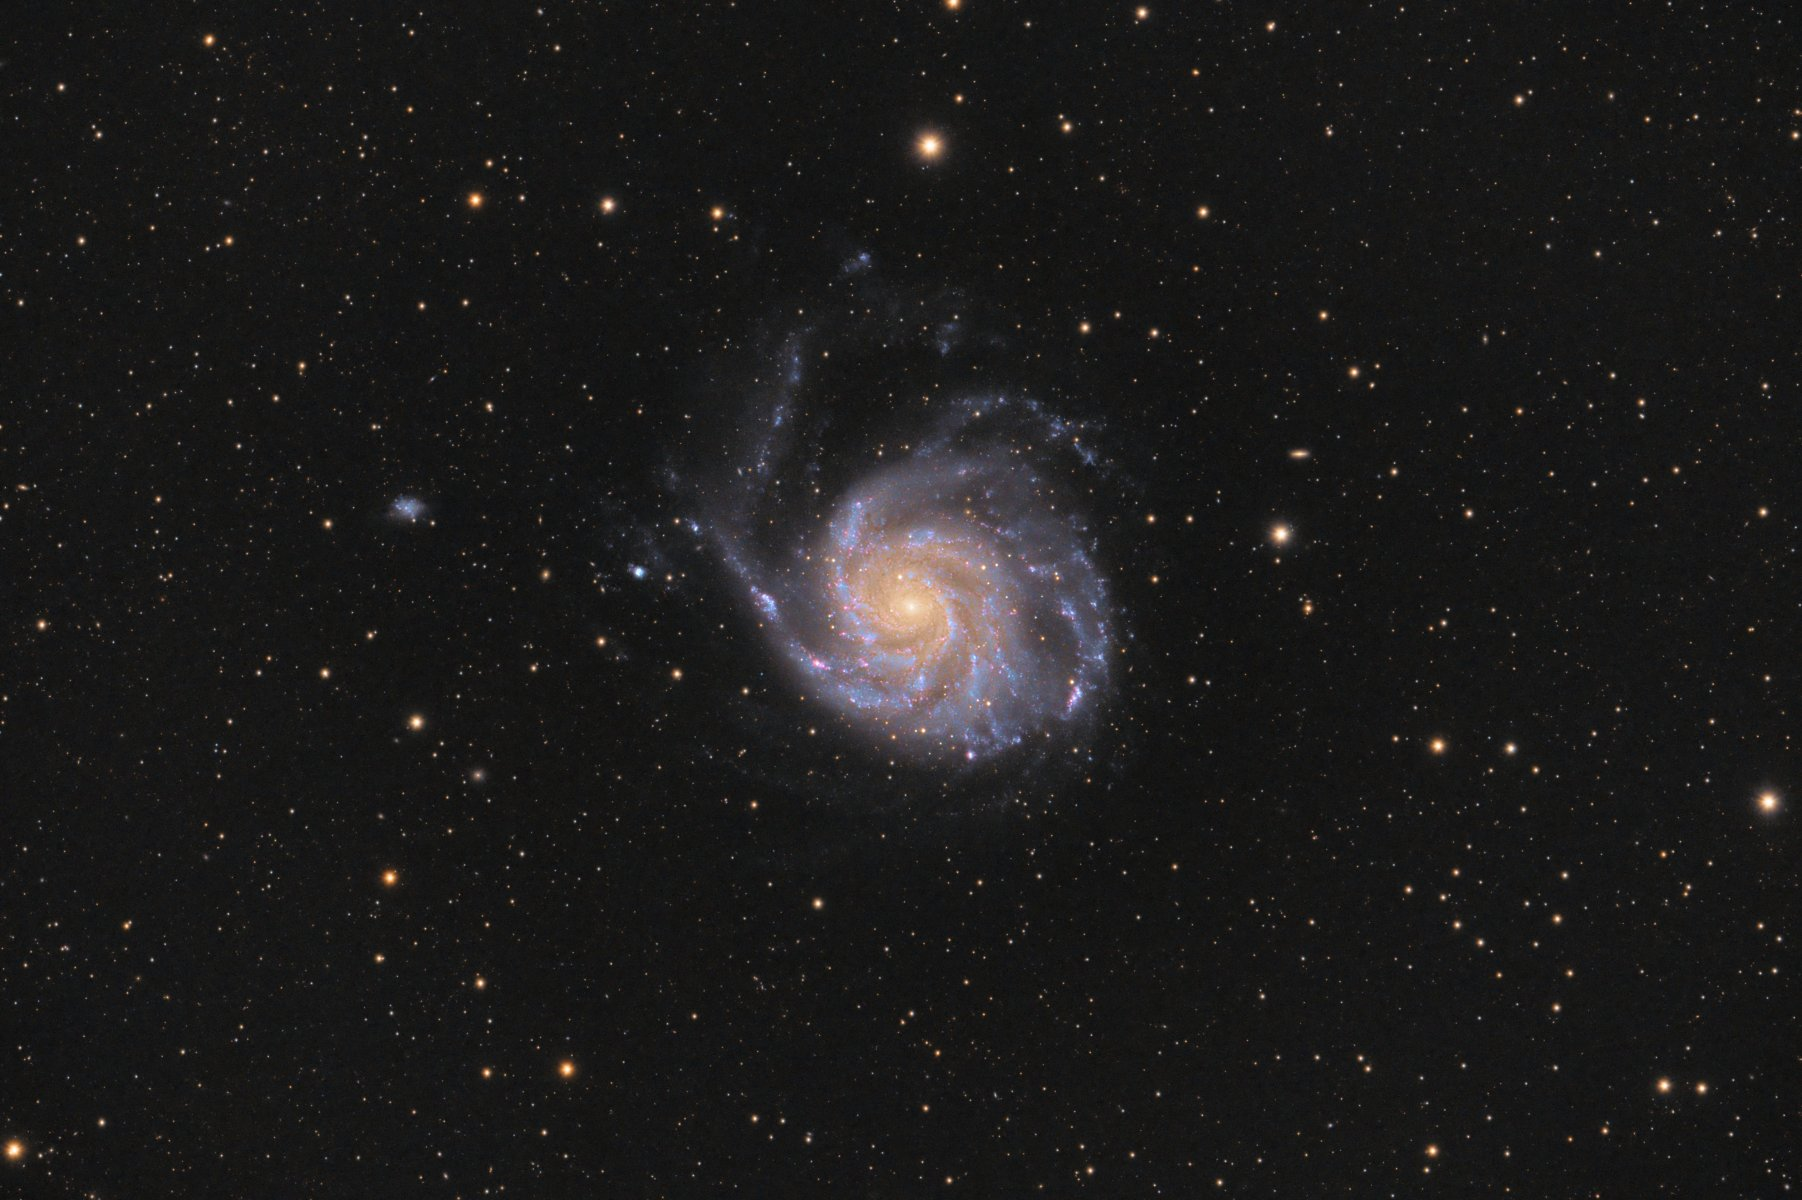 M101-RGB-session_1_session_2_session_3-mod-lpc-cbg-csc-St.jpg